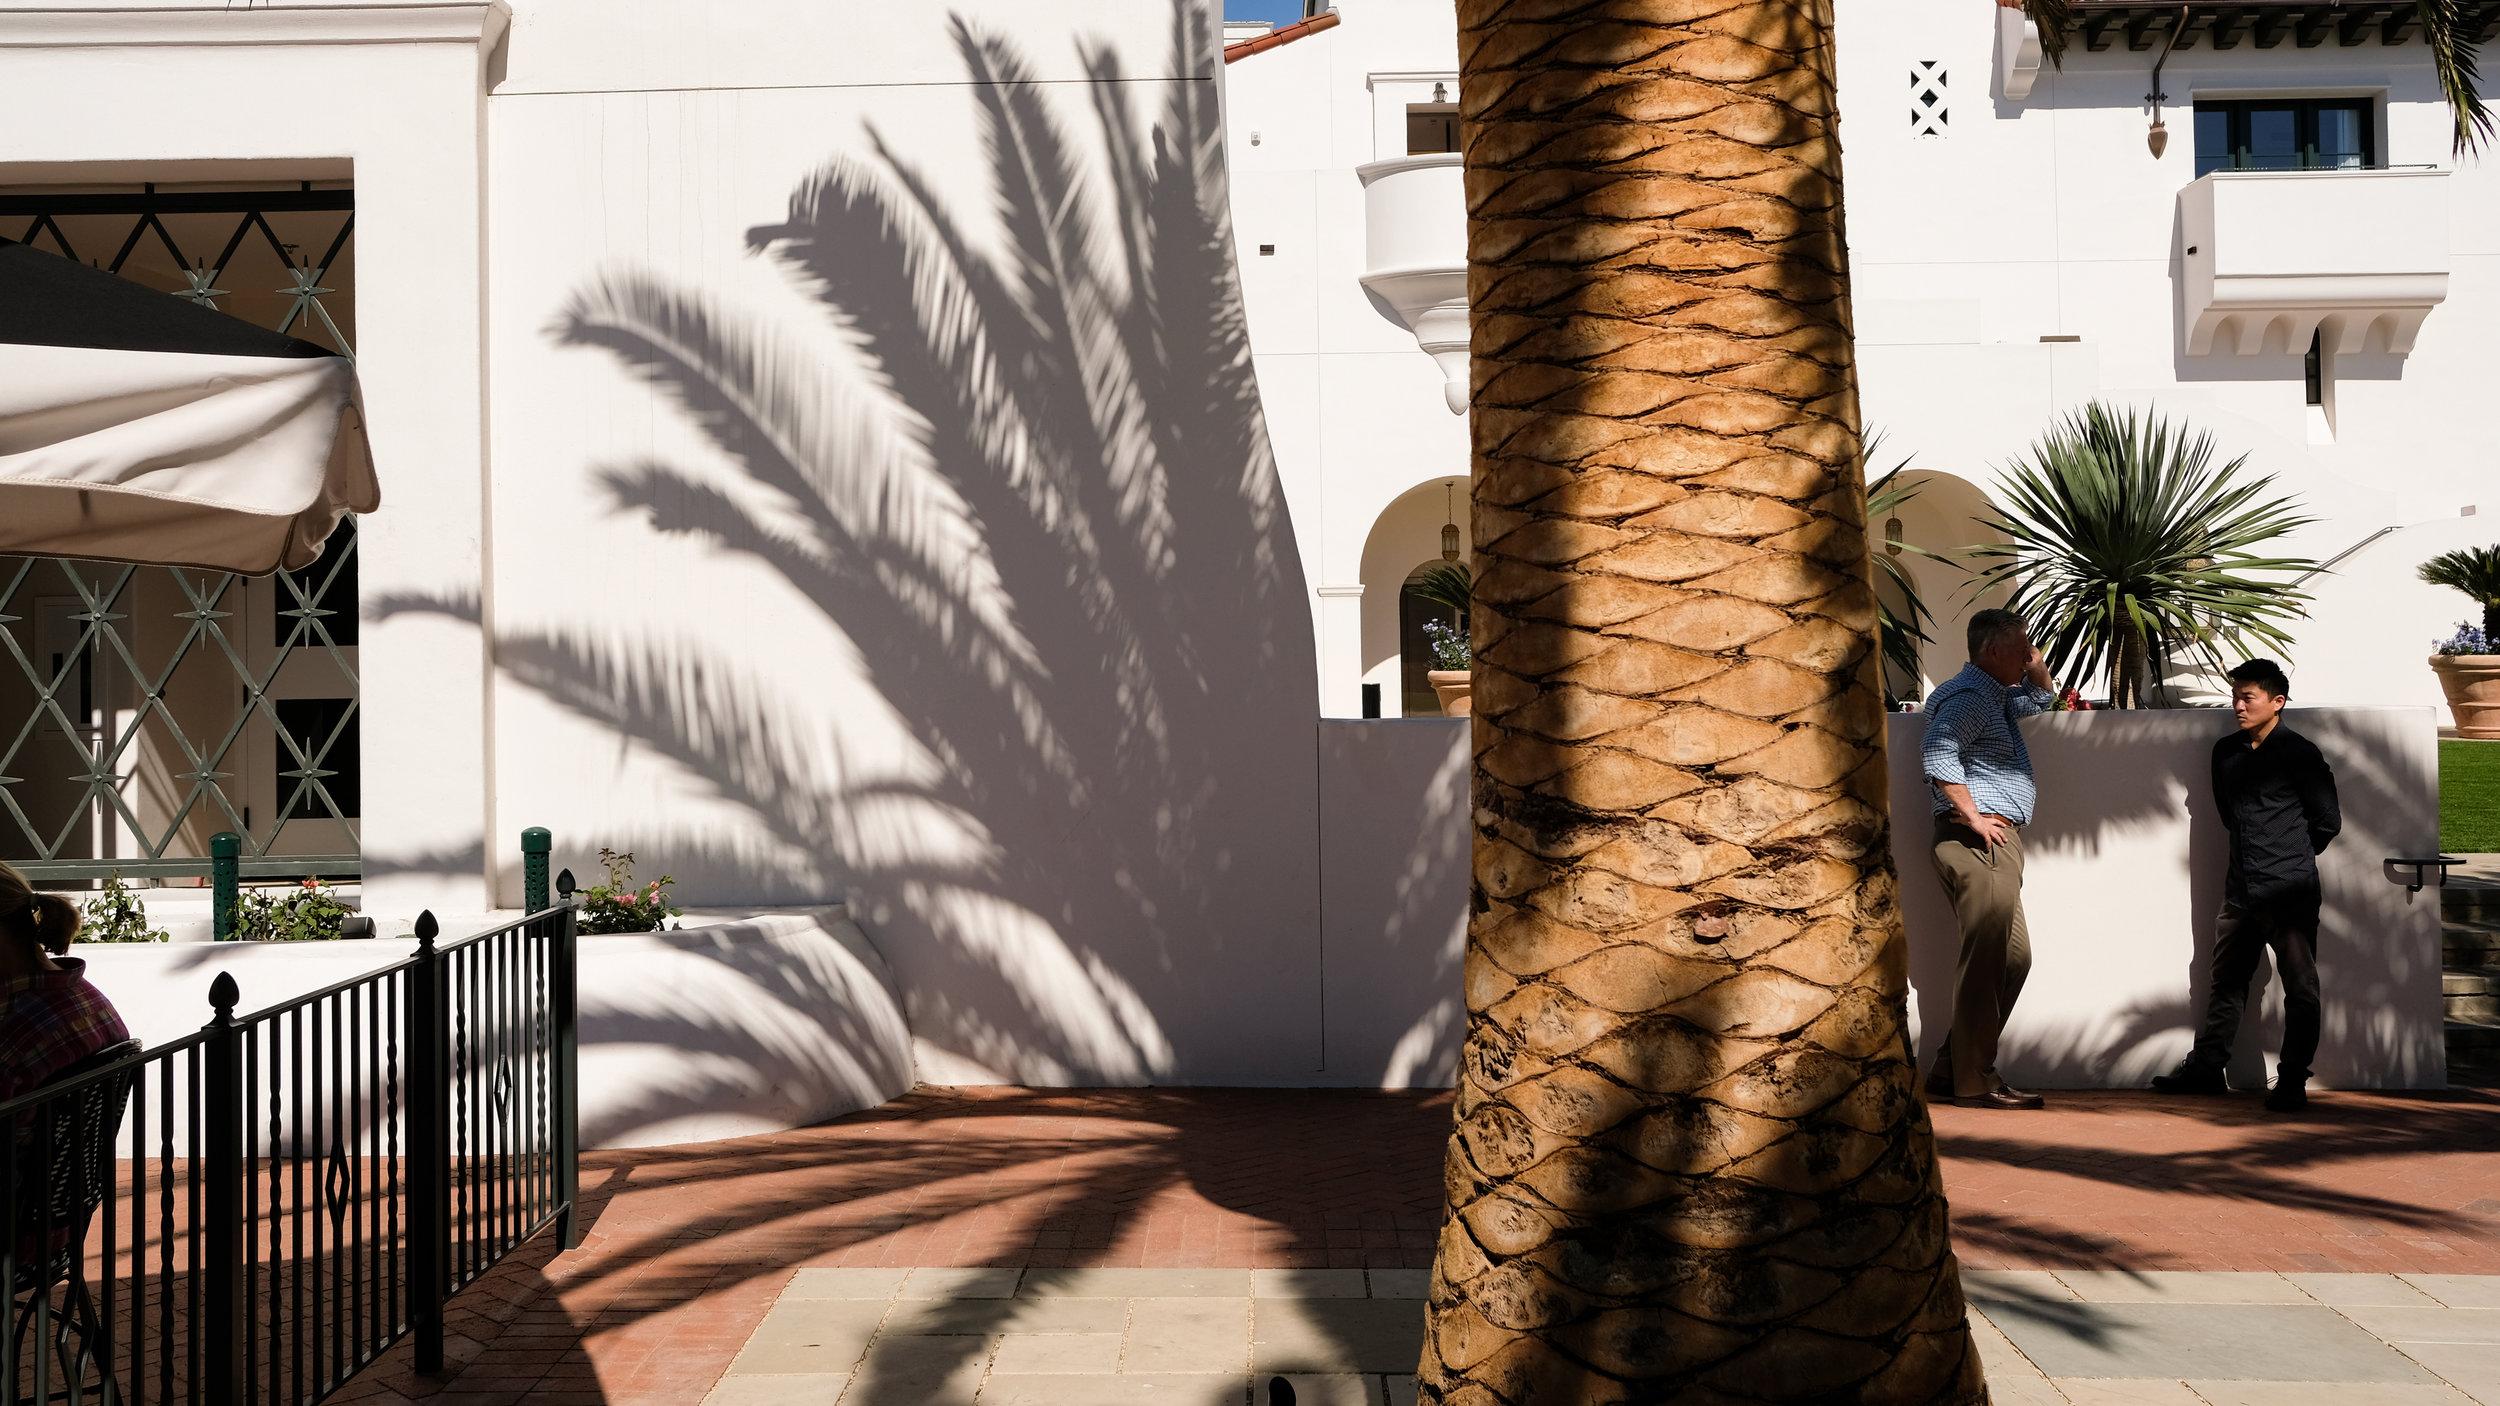 19_SANTA_BARBARA_palmtree.jpg